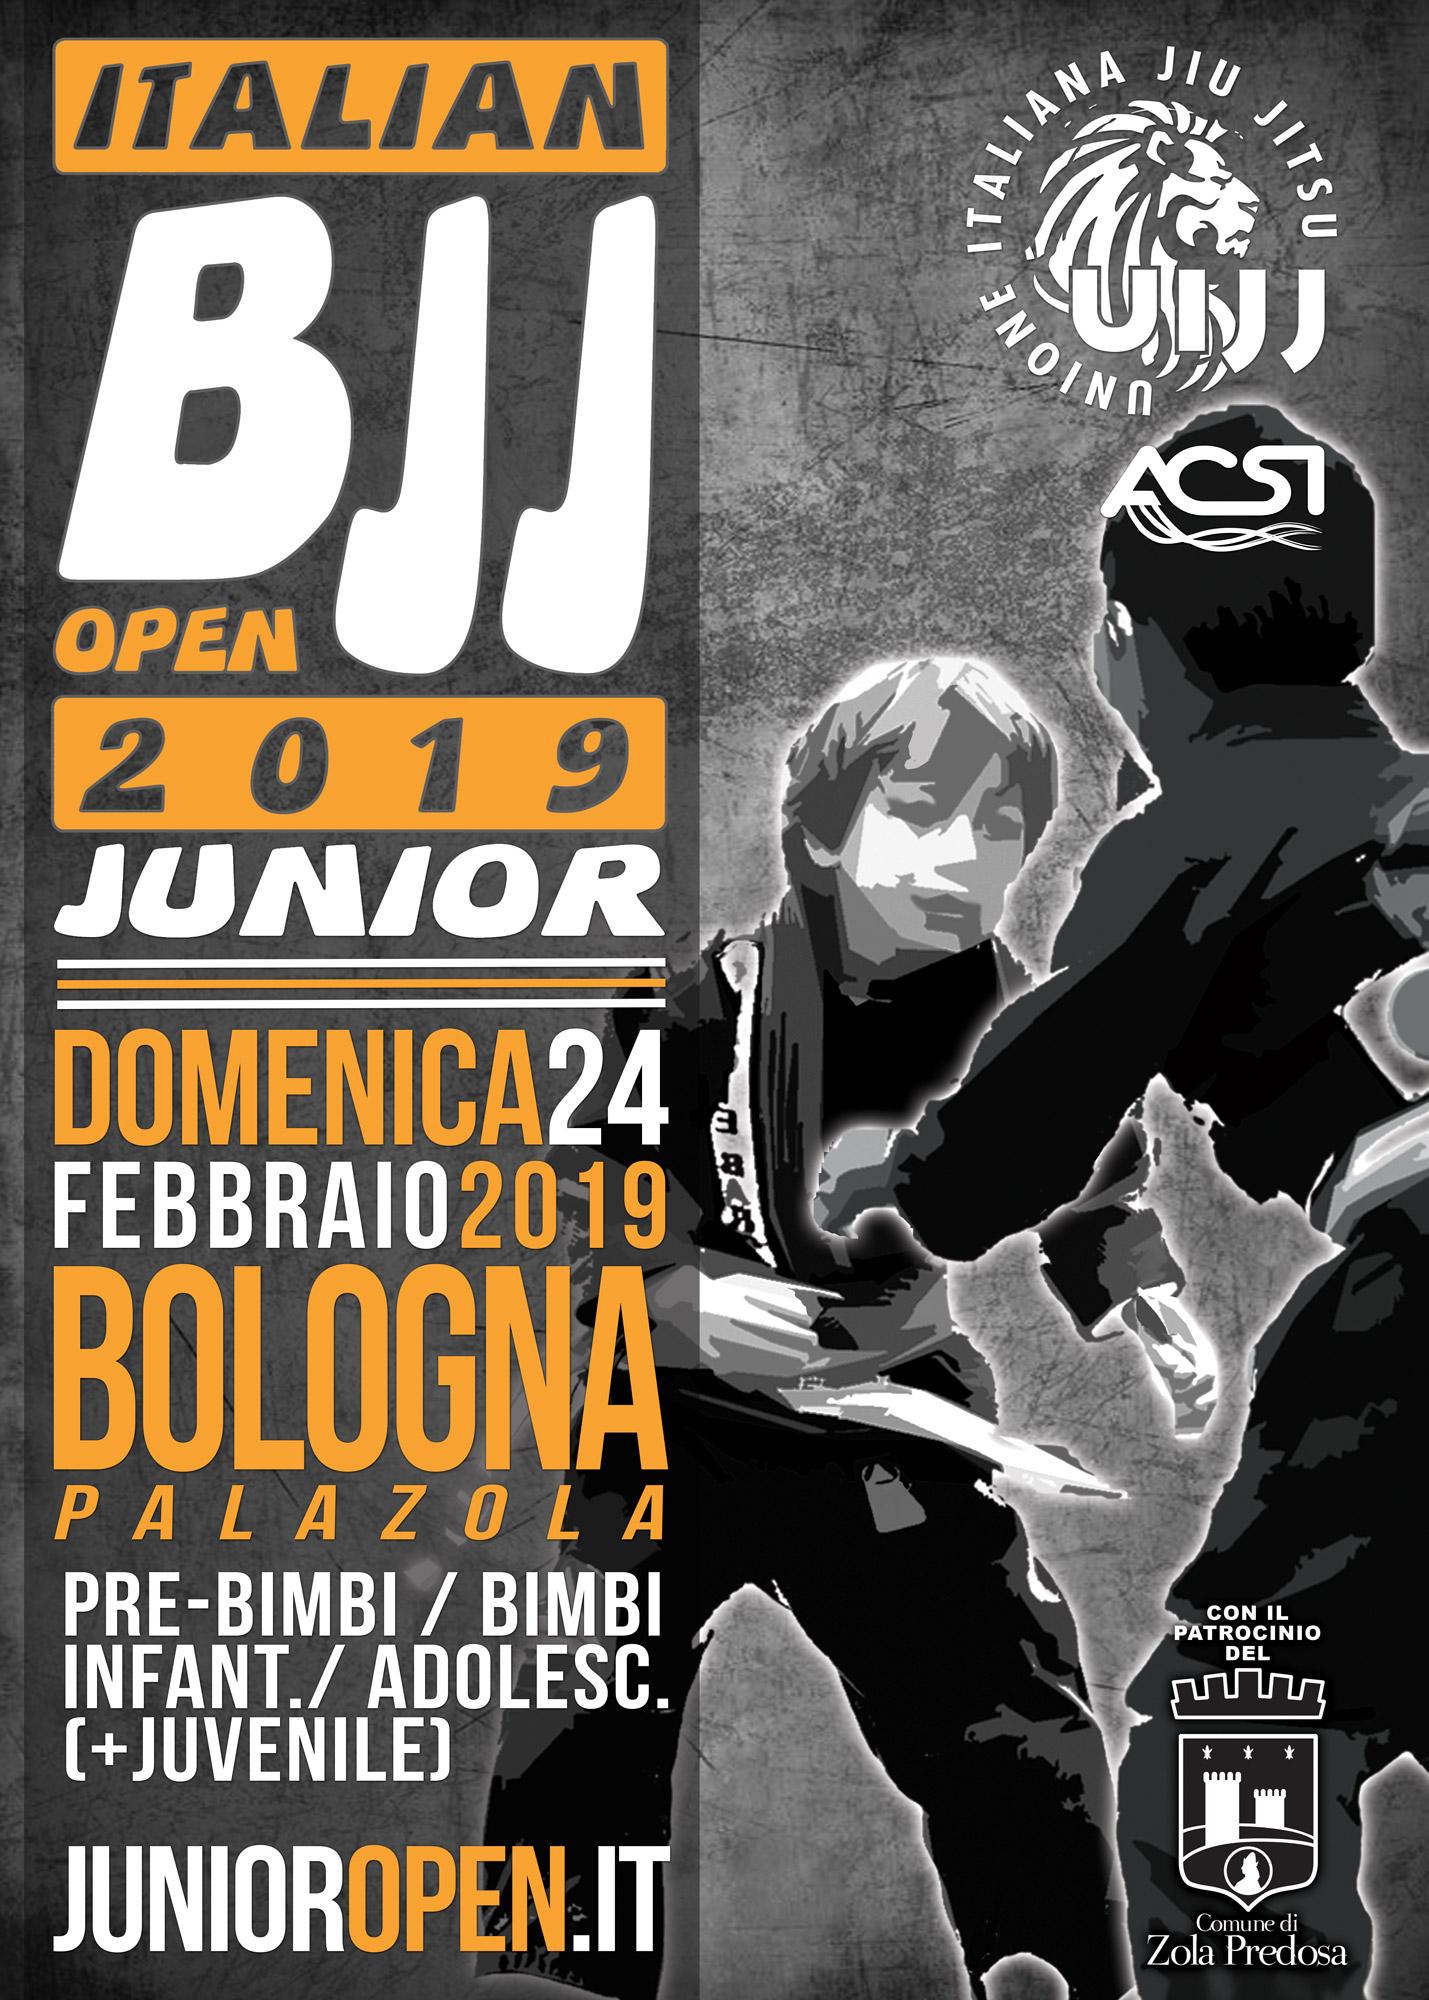 poster-italian-junior-open-2019-patrocini.jpg